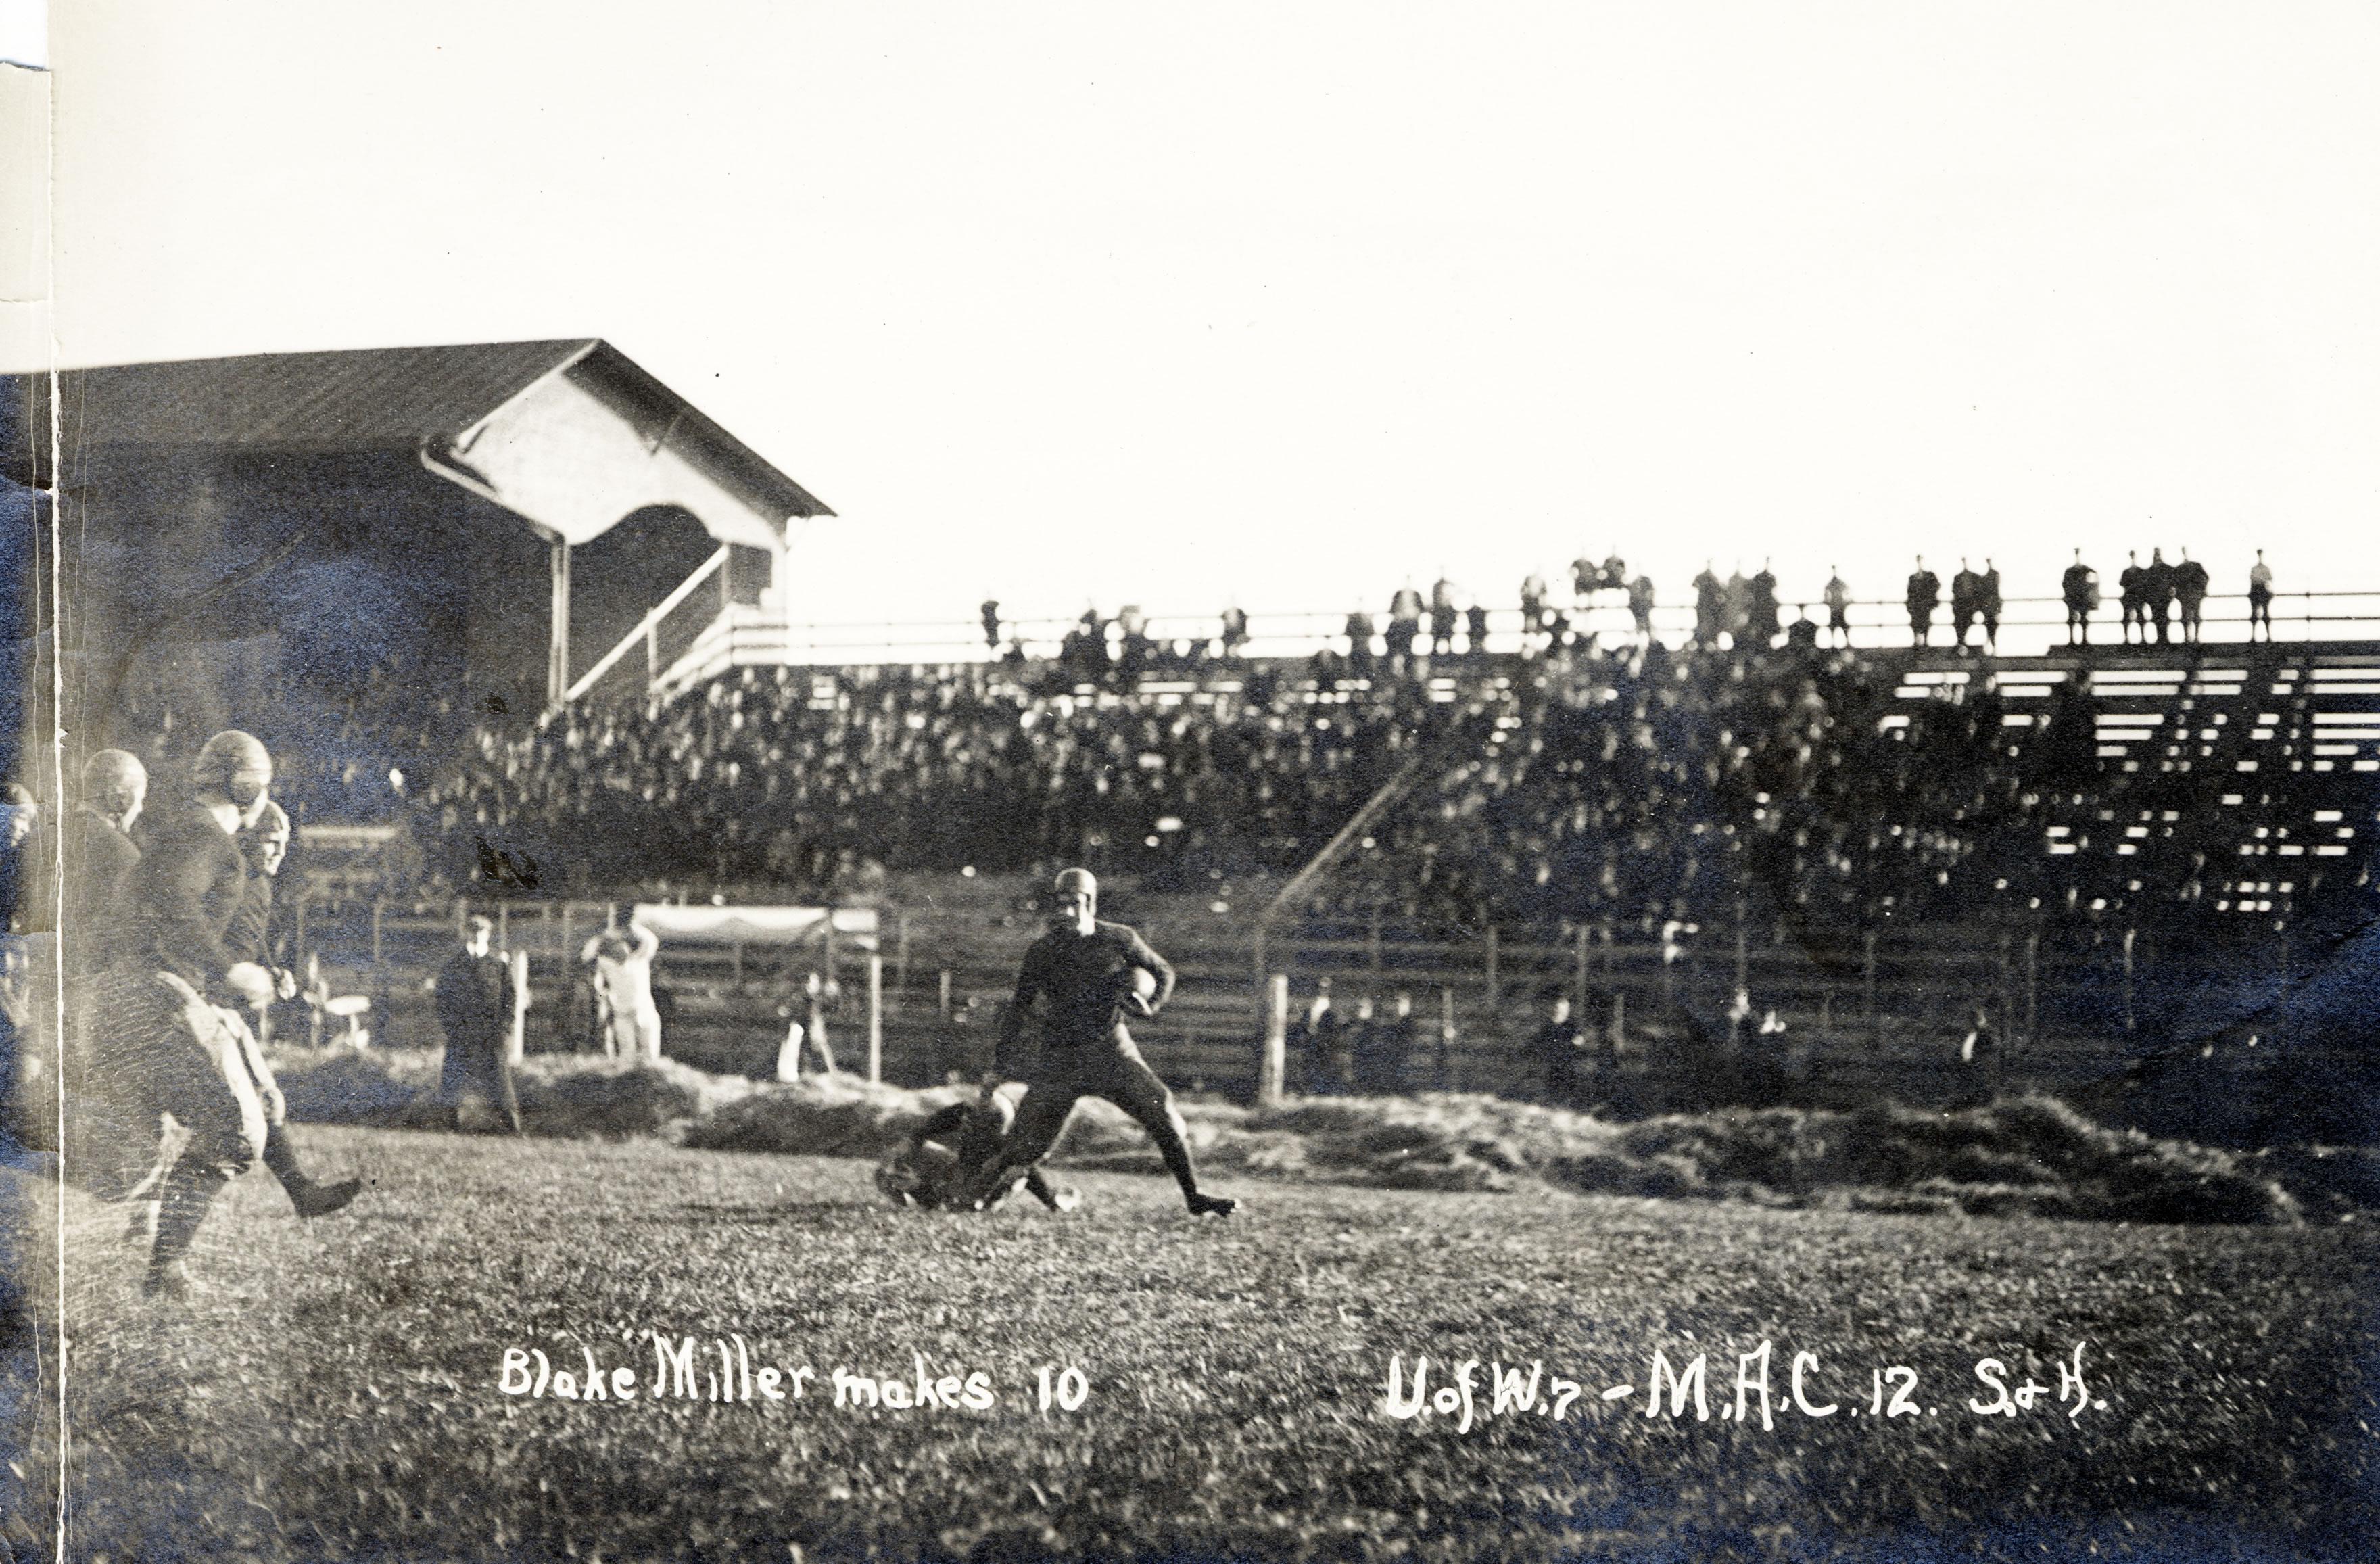 """Blake Miller makes 10"" at U of W vs M.A.C. football game, 1913"